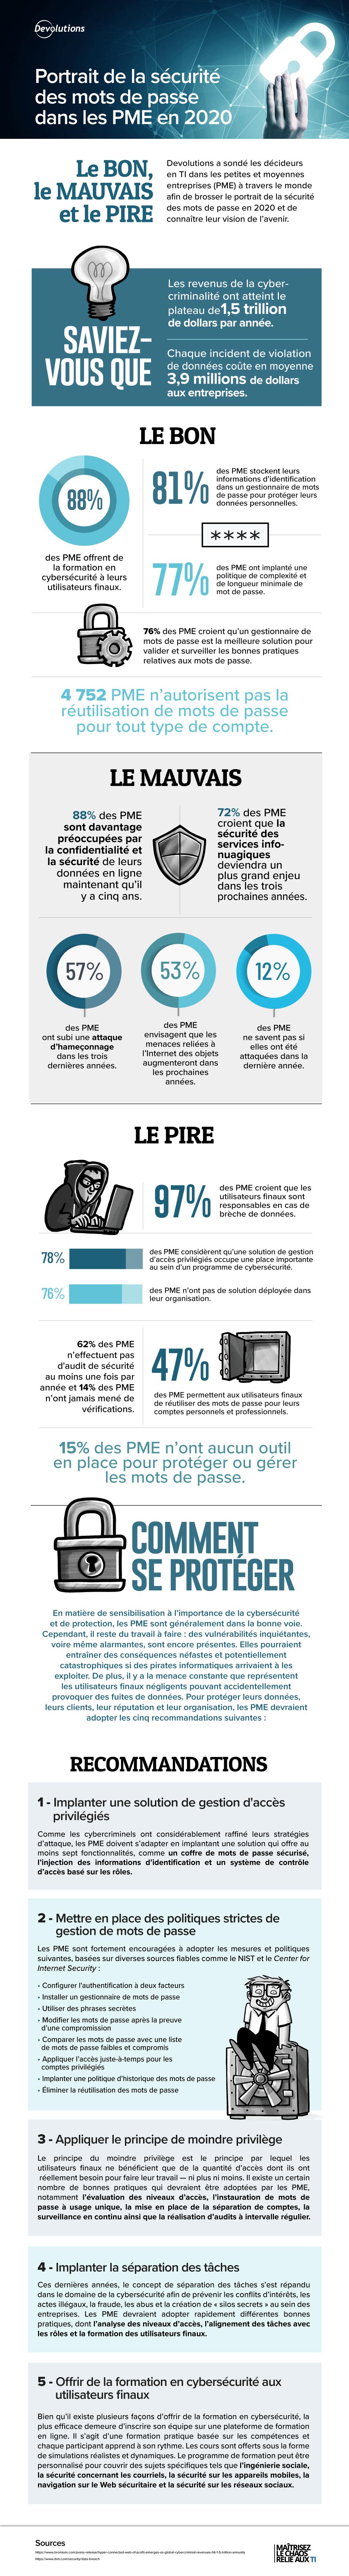 survey infographic FR